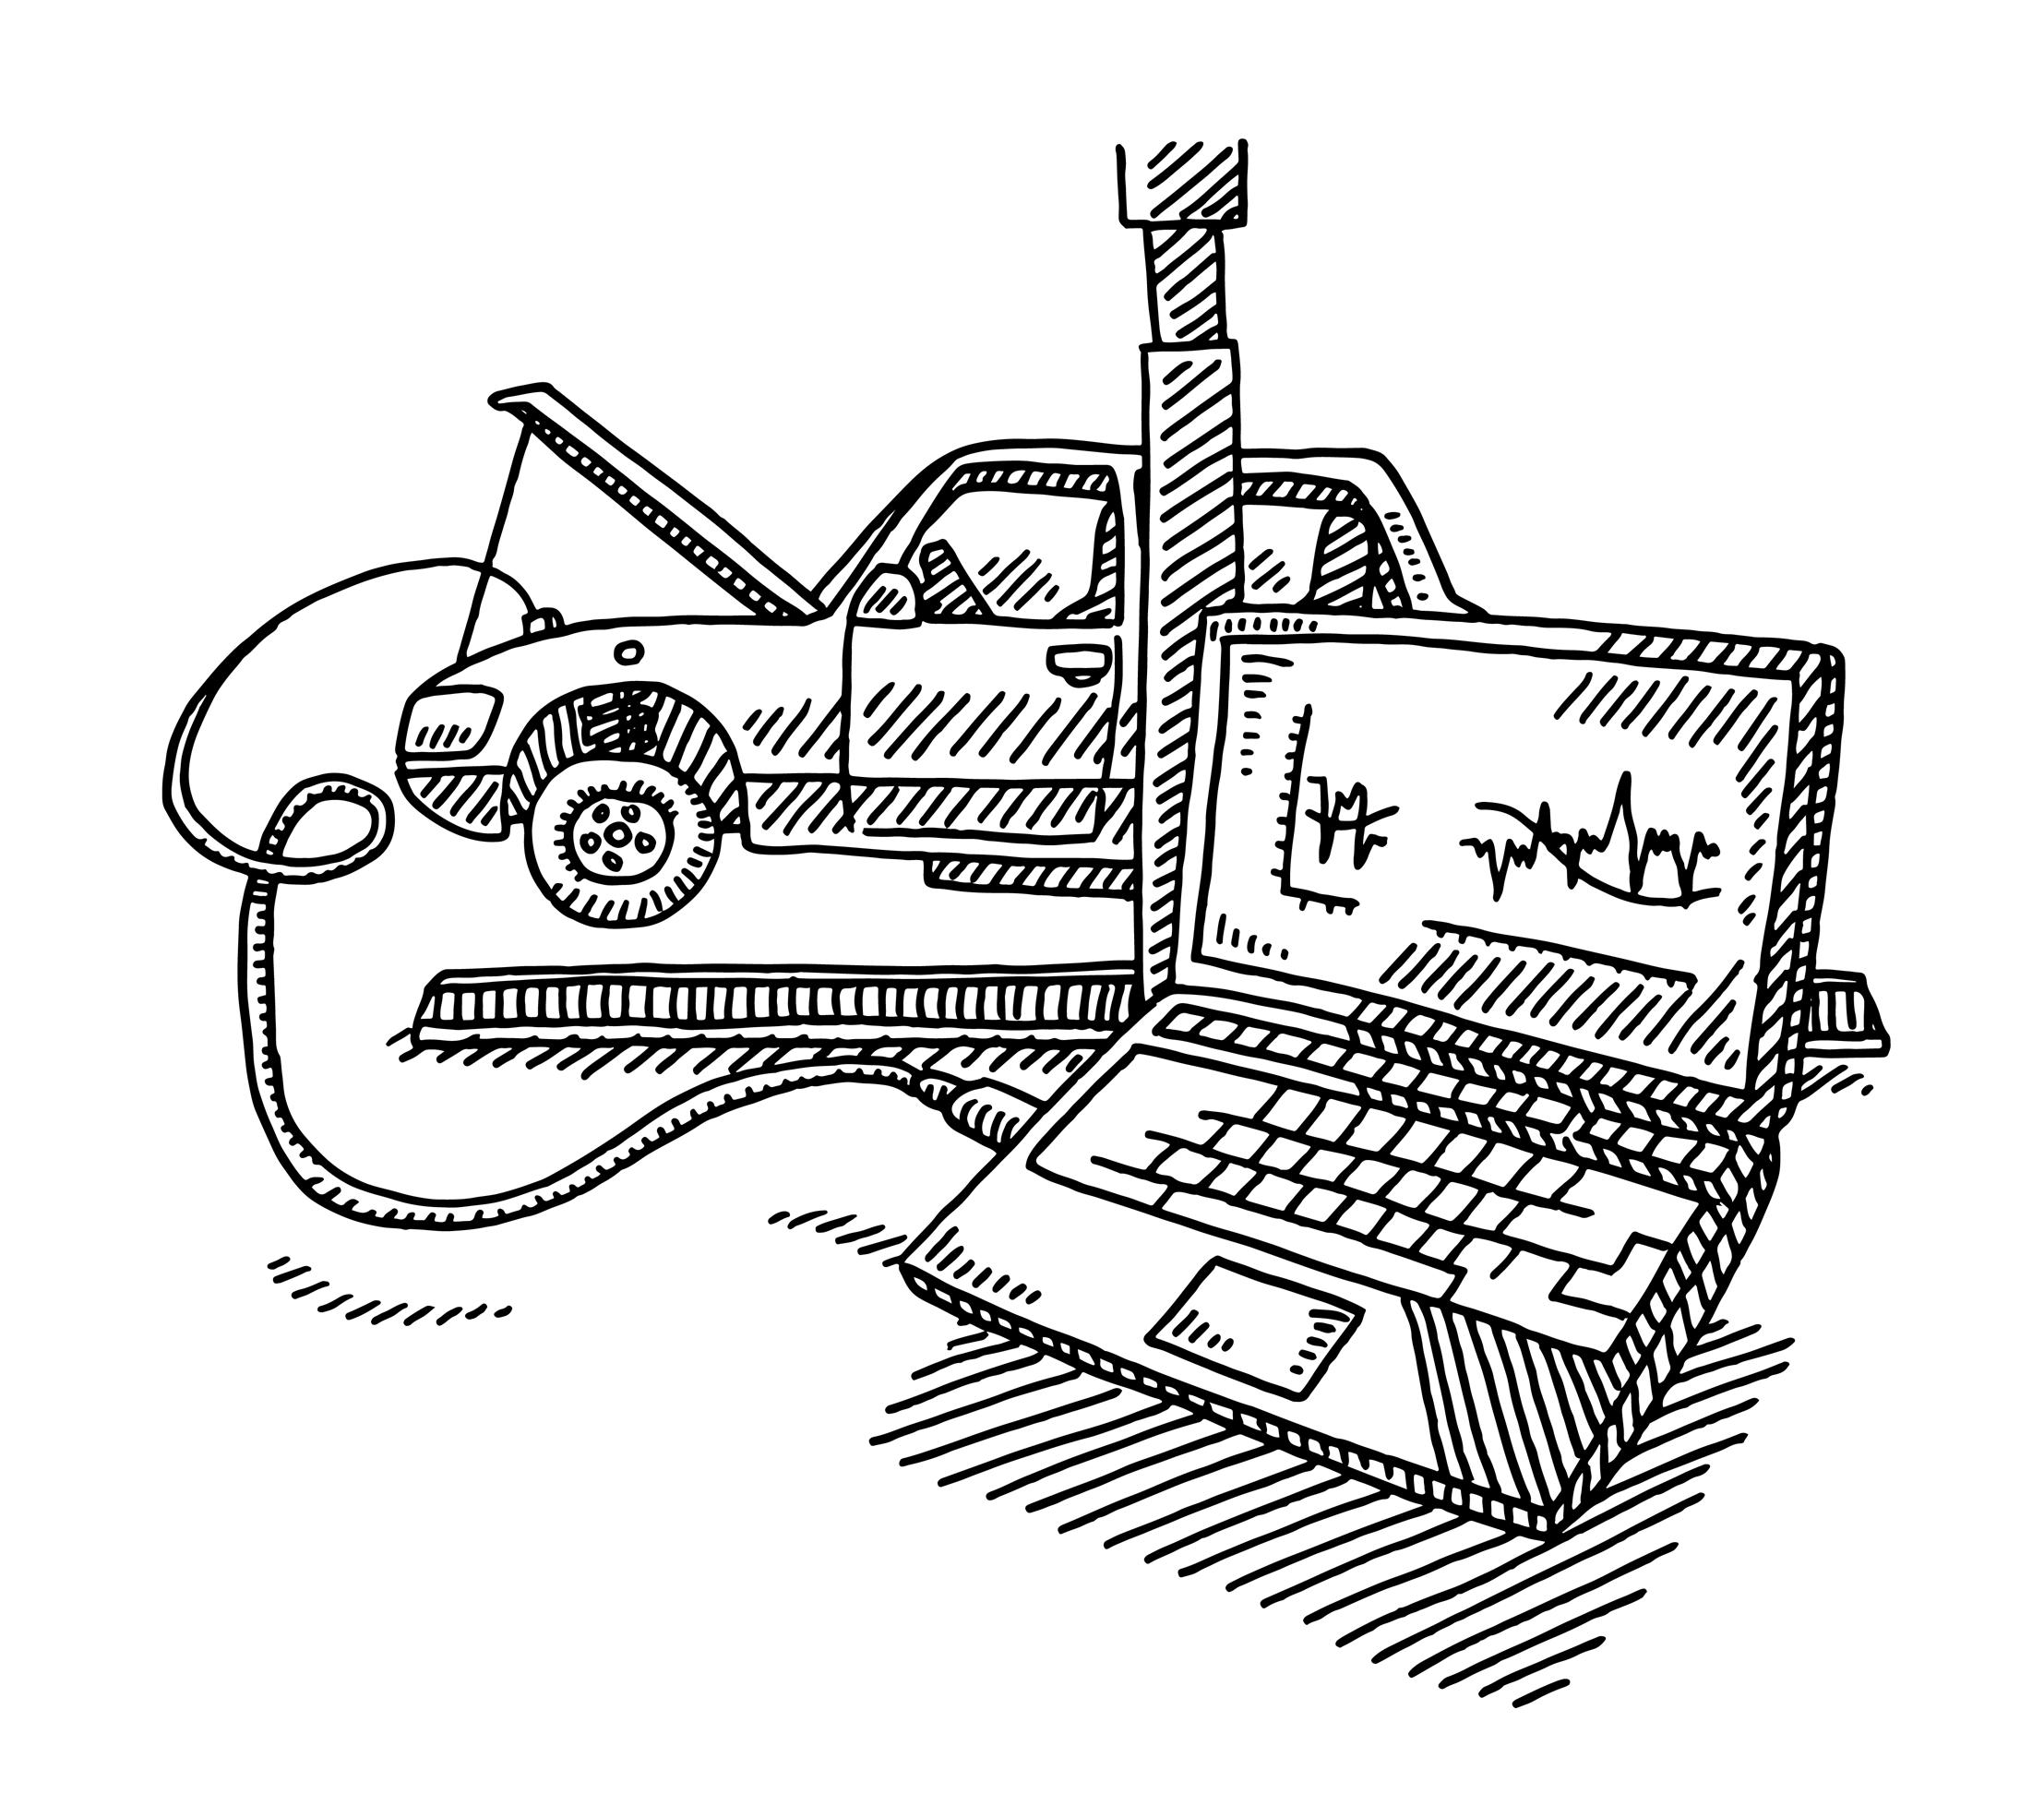 maintenance management for company car fleets